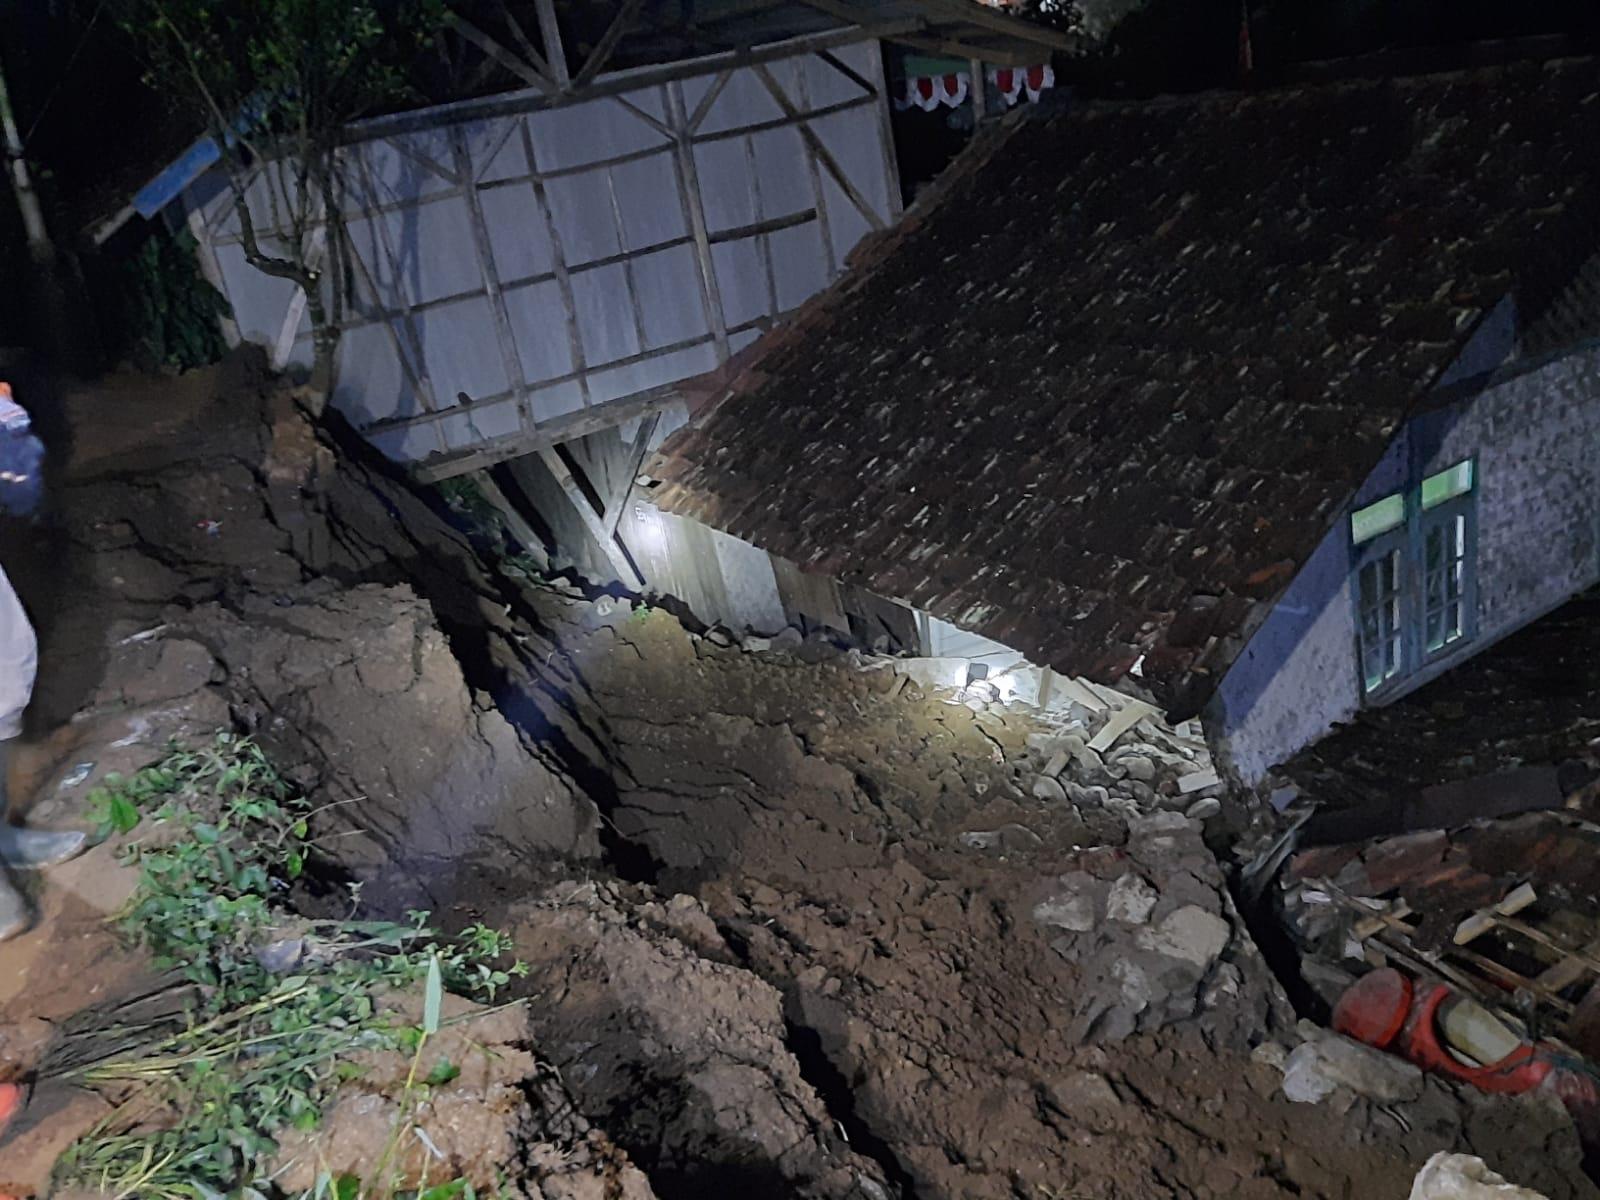 https: img.okezone.com content 2021 09 20 525 2474139 tanah-longsor-cianjur-akibatkan-satu-warga-luka-berat-k9WBeSRT7f.jpeg